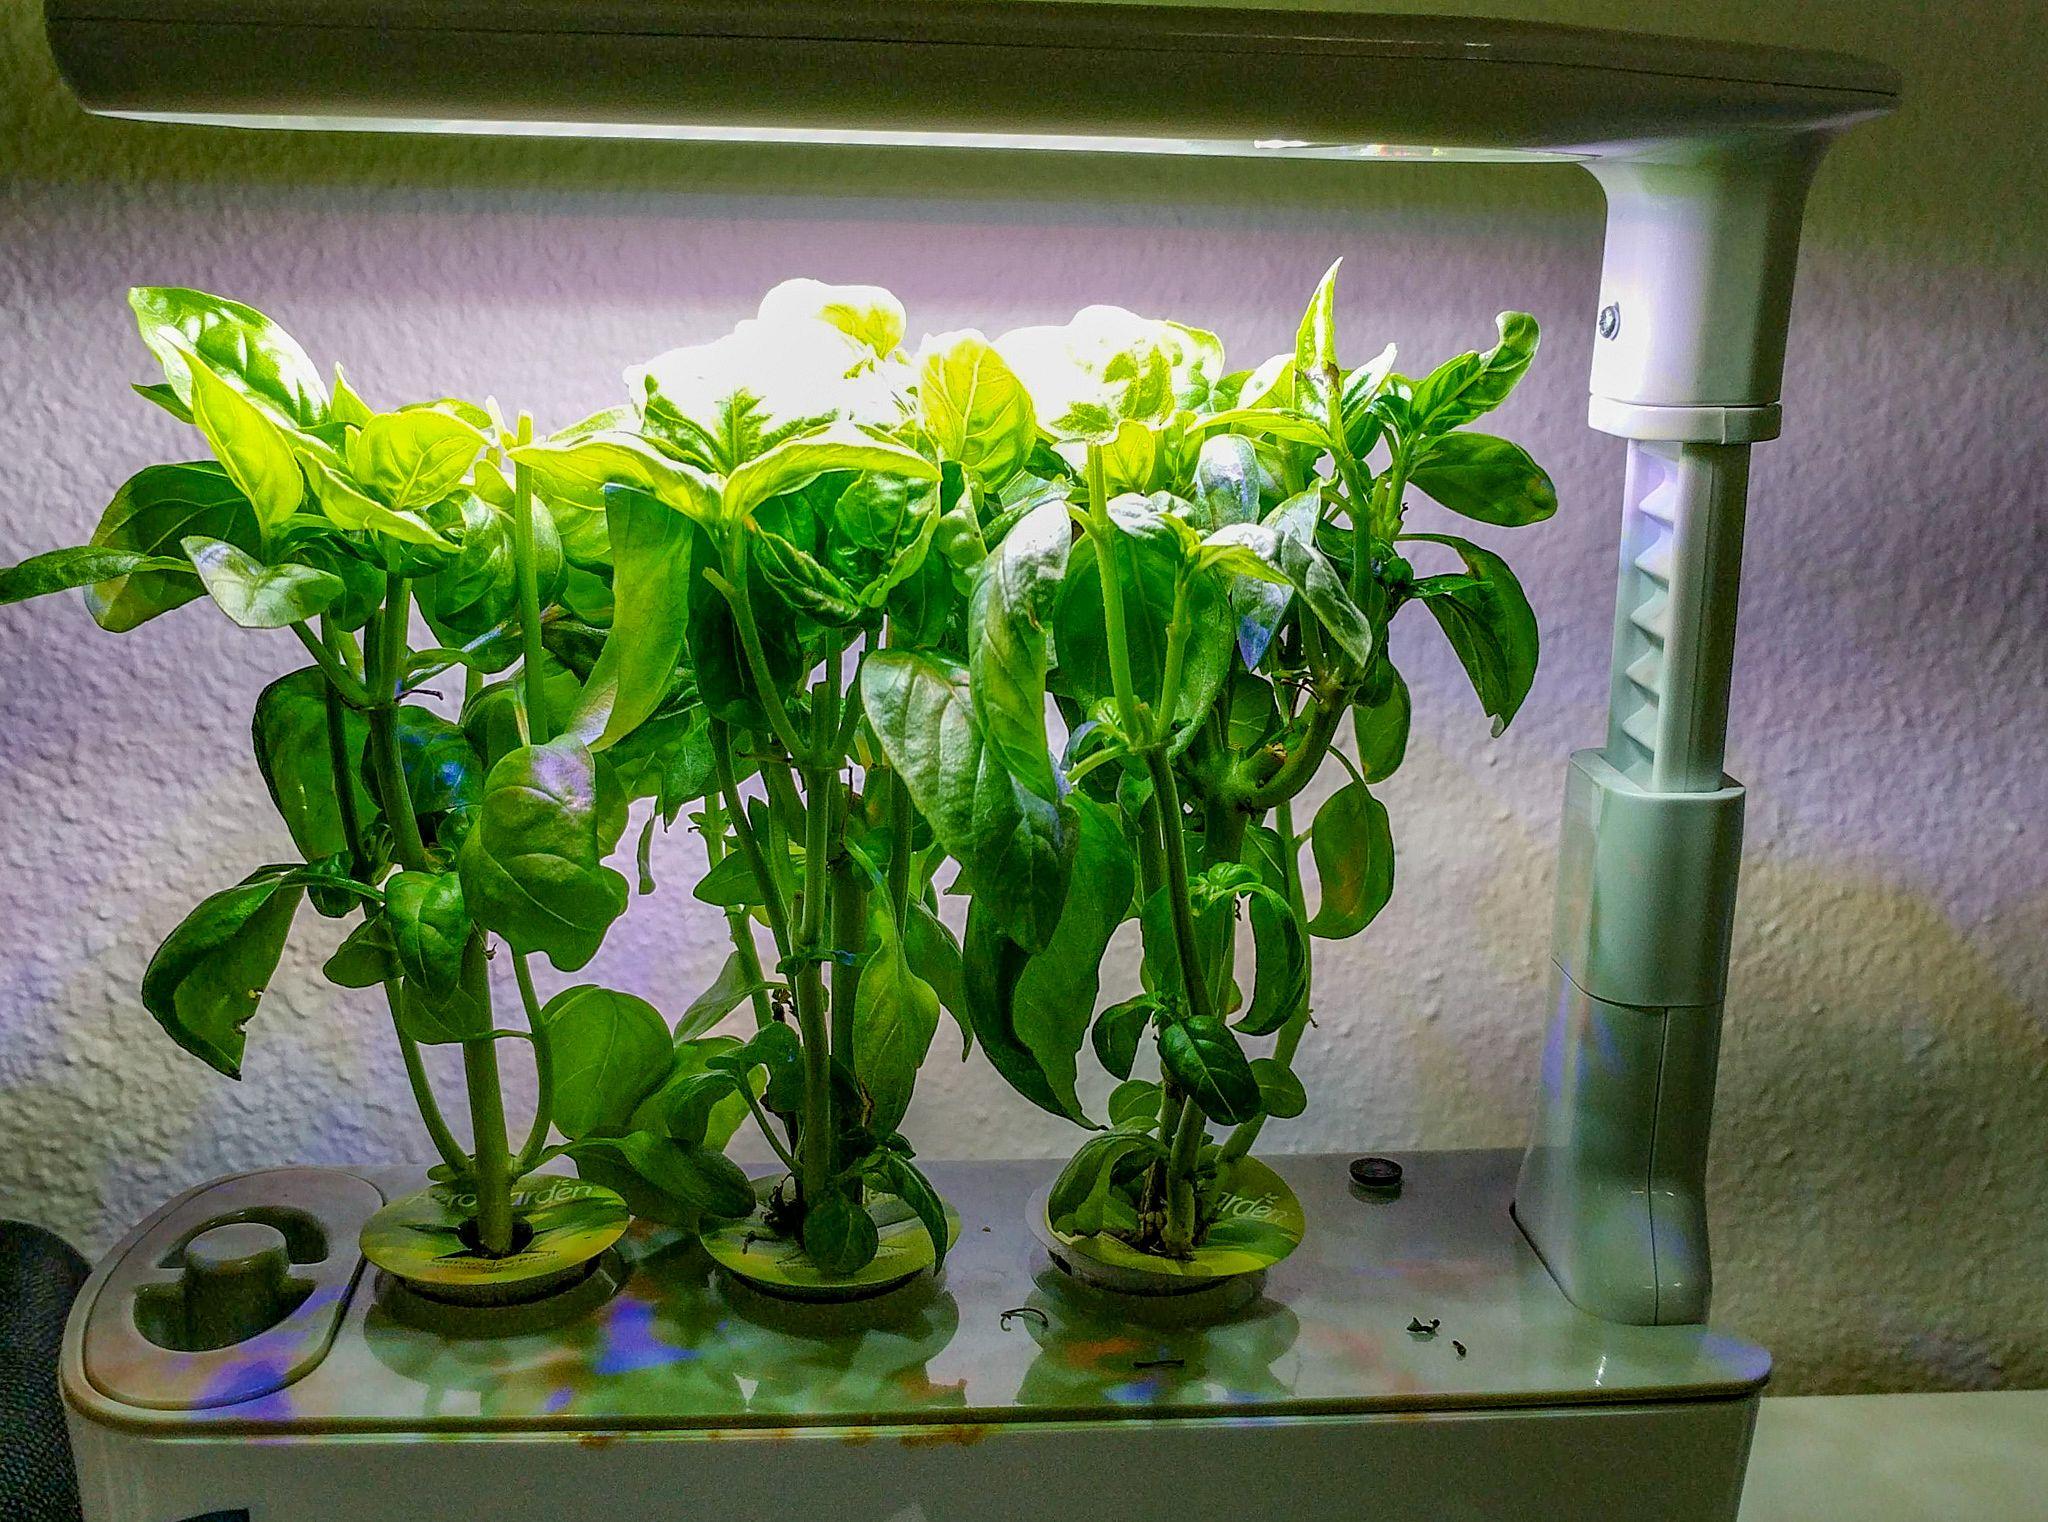 Growing Basil in an AeroGarden